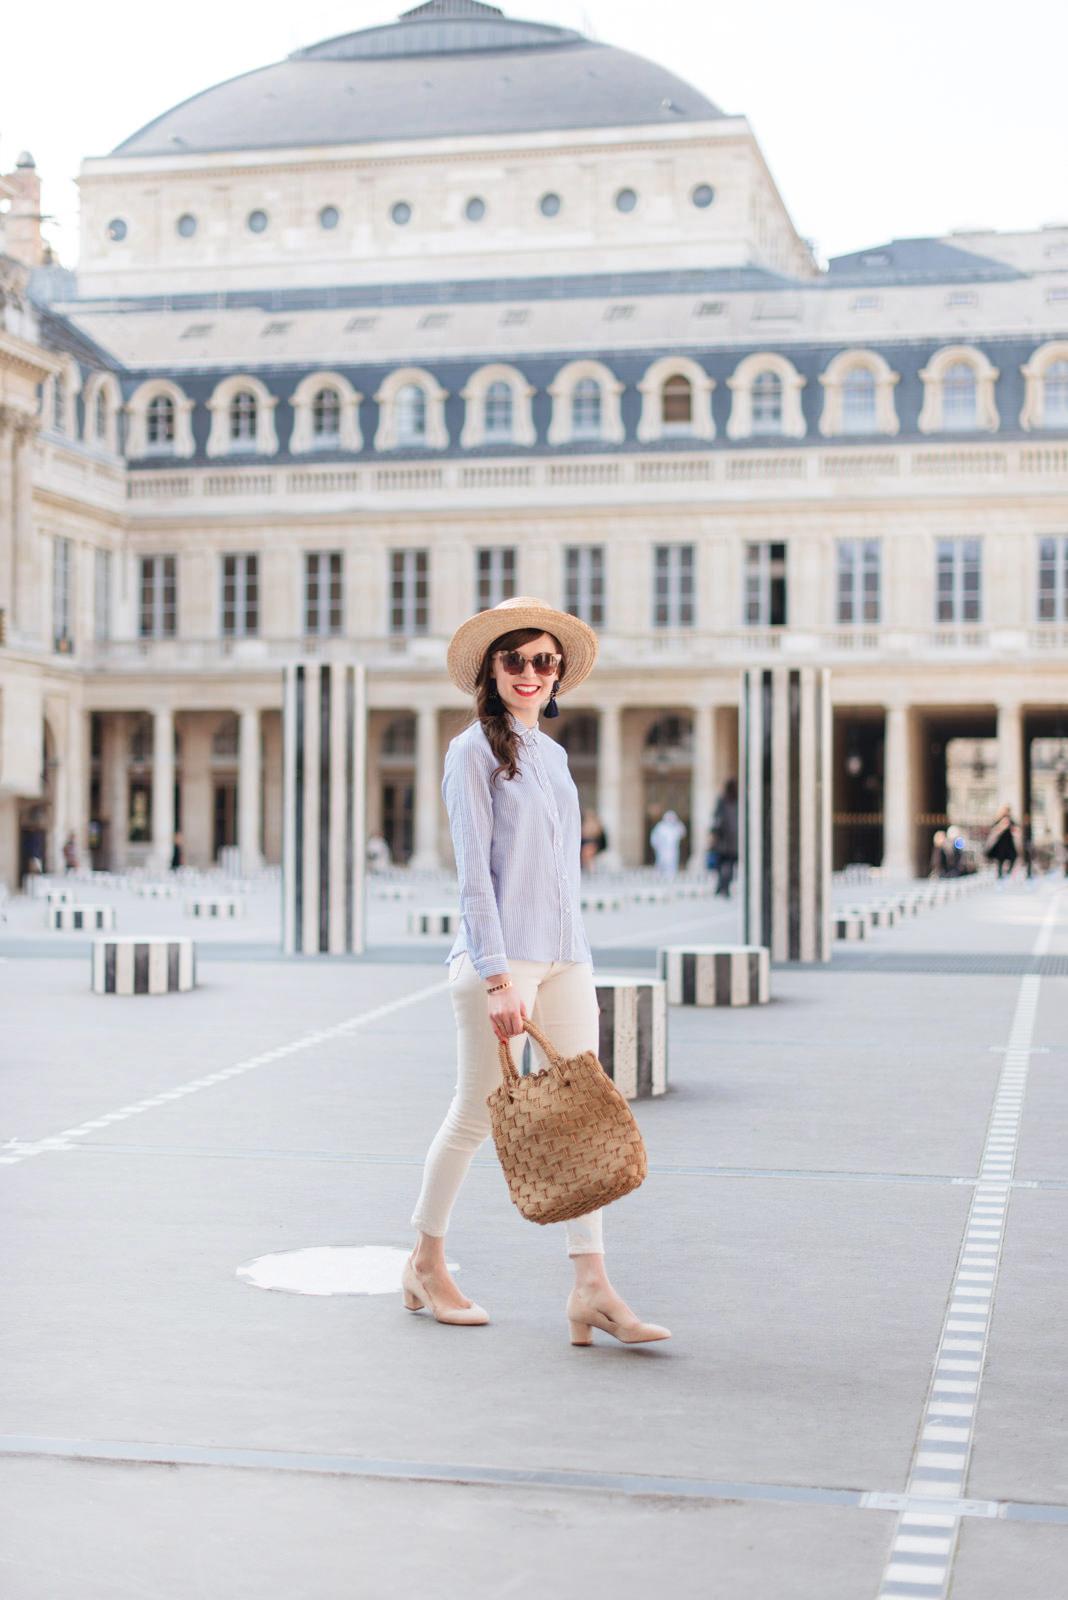 Blog-Mode-And-The-City-Looks-Printemps-Palais-Royal